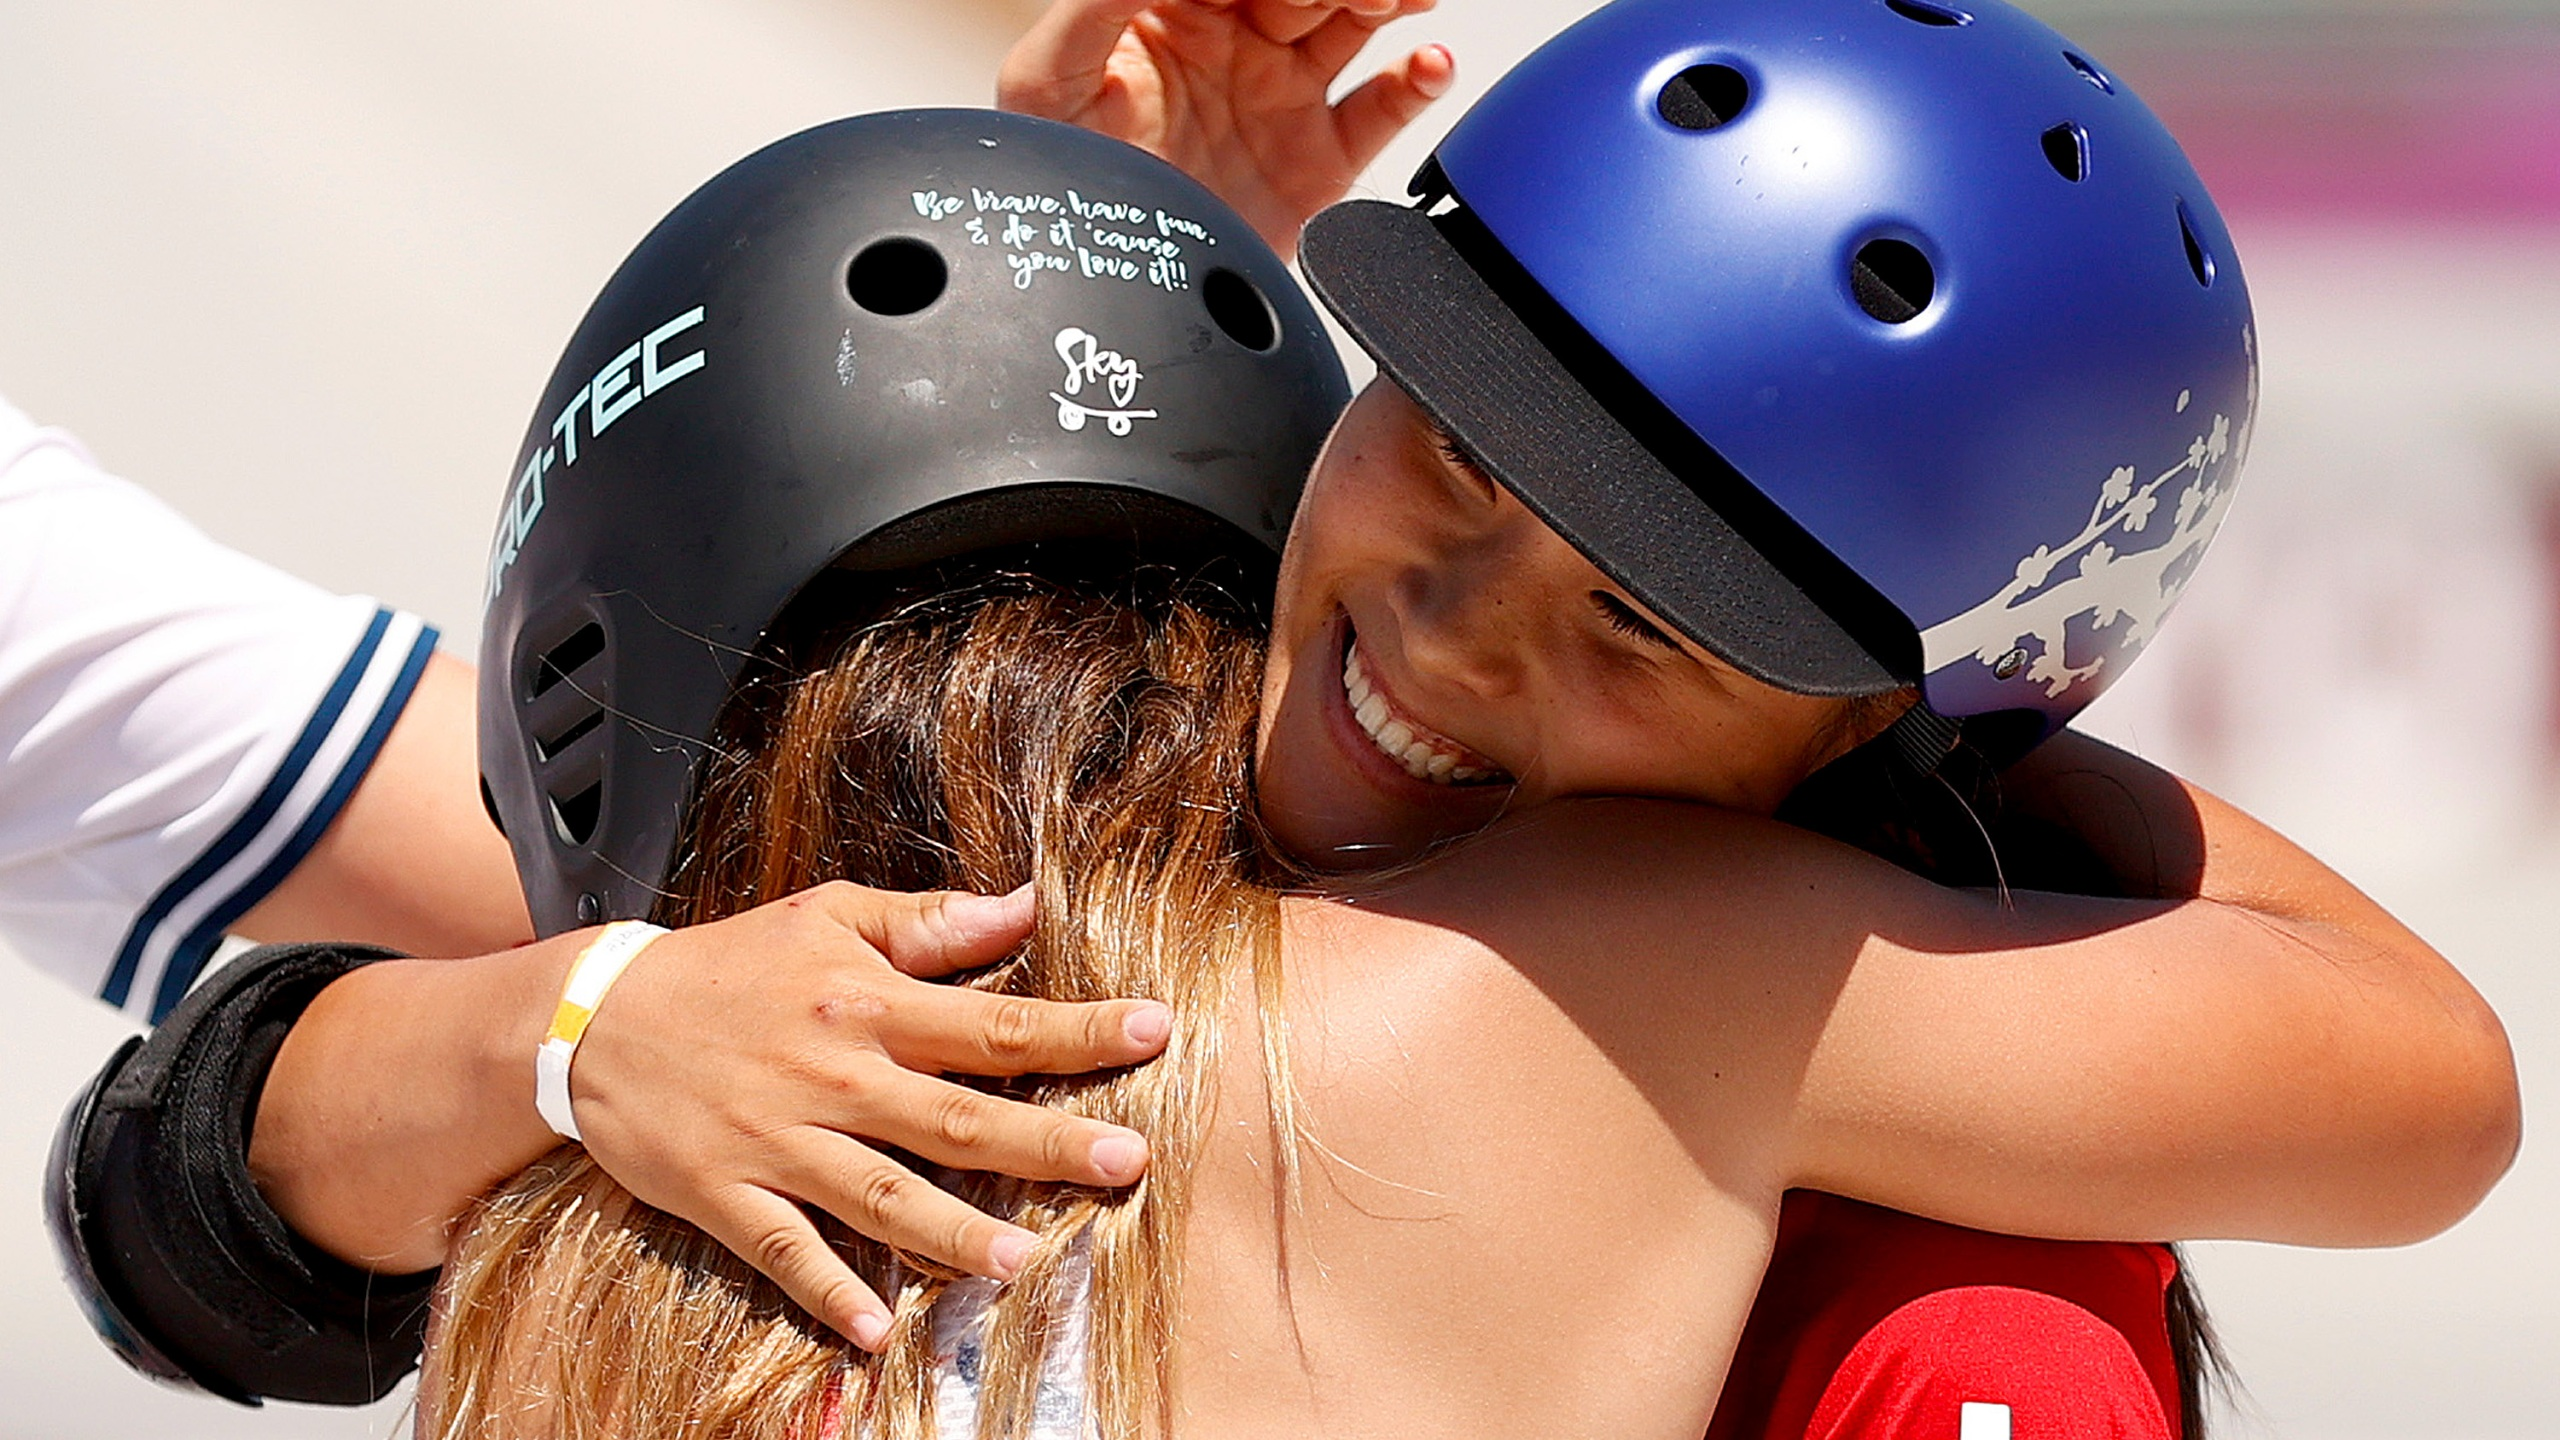 image of athletes hugging